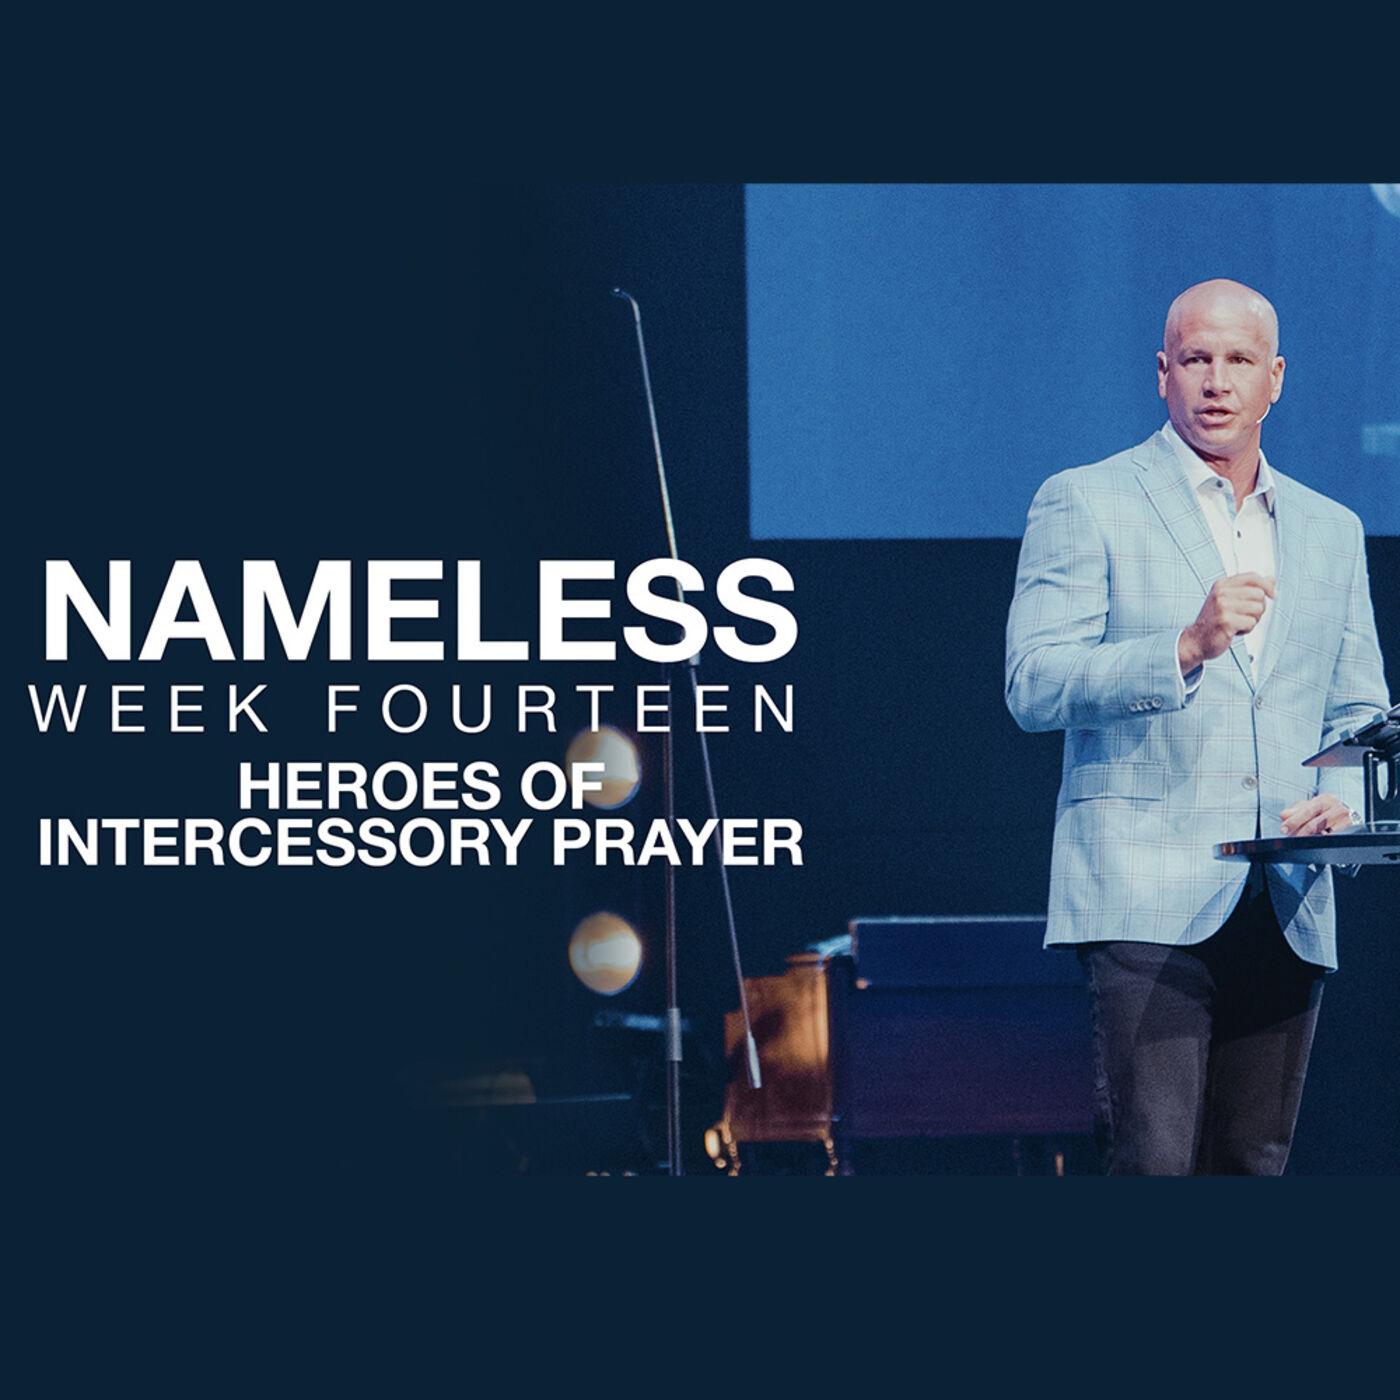 Nameless Week Fourteen // The Nameless Heroes of Intercessory Prayer